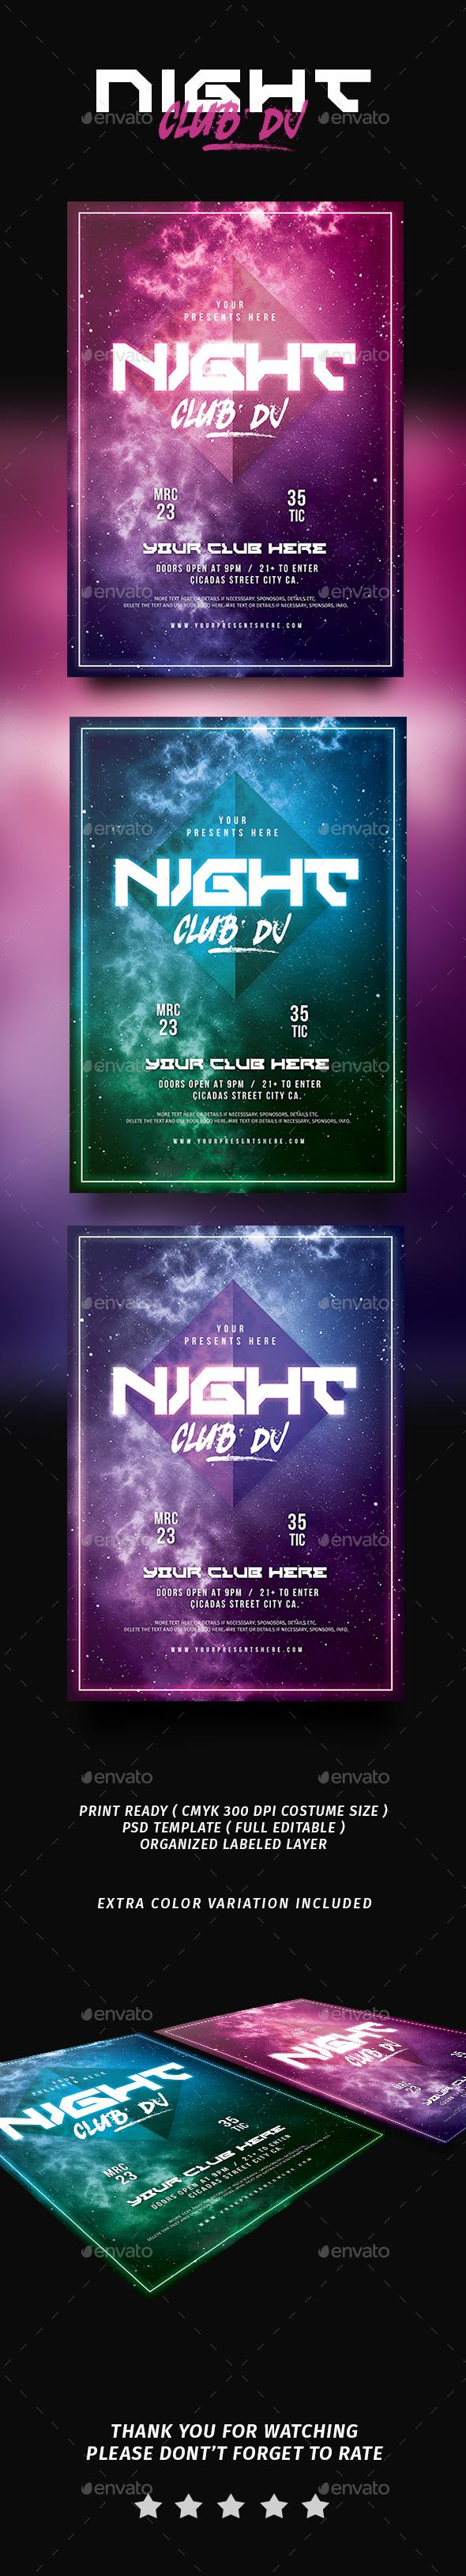 Night Club DJ Flyer - Flyers Print Templates